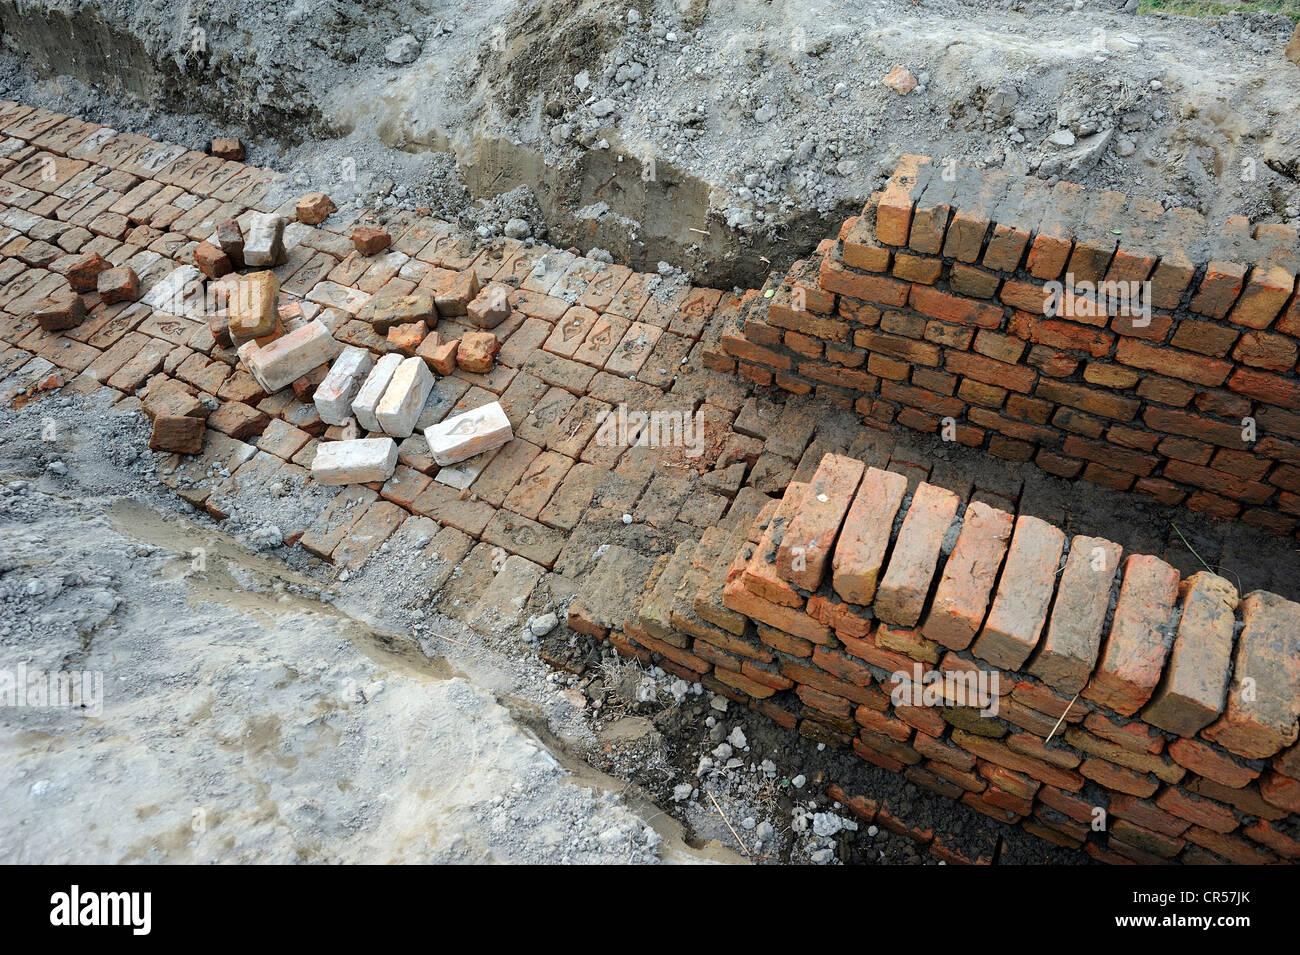 Ziegel, Baustelle des einen Bewässerungskanal, Basti Lehar Walla Dorf, Punjab, Pakistan, Asien Stockfoto